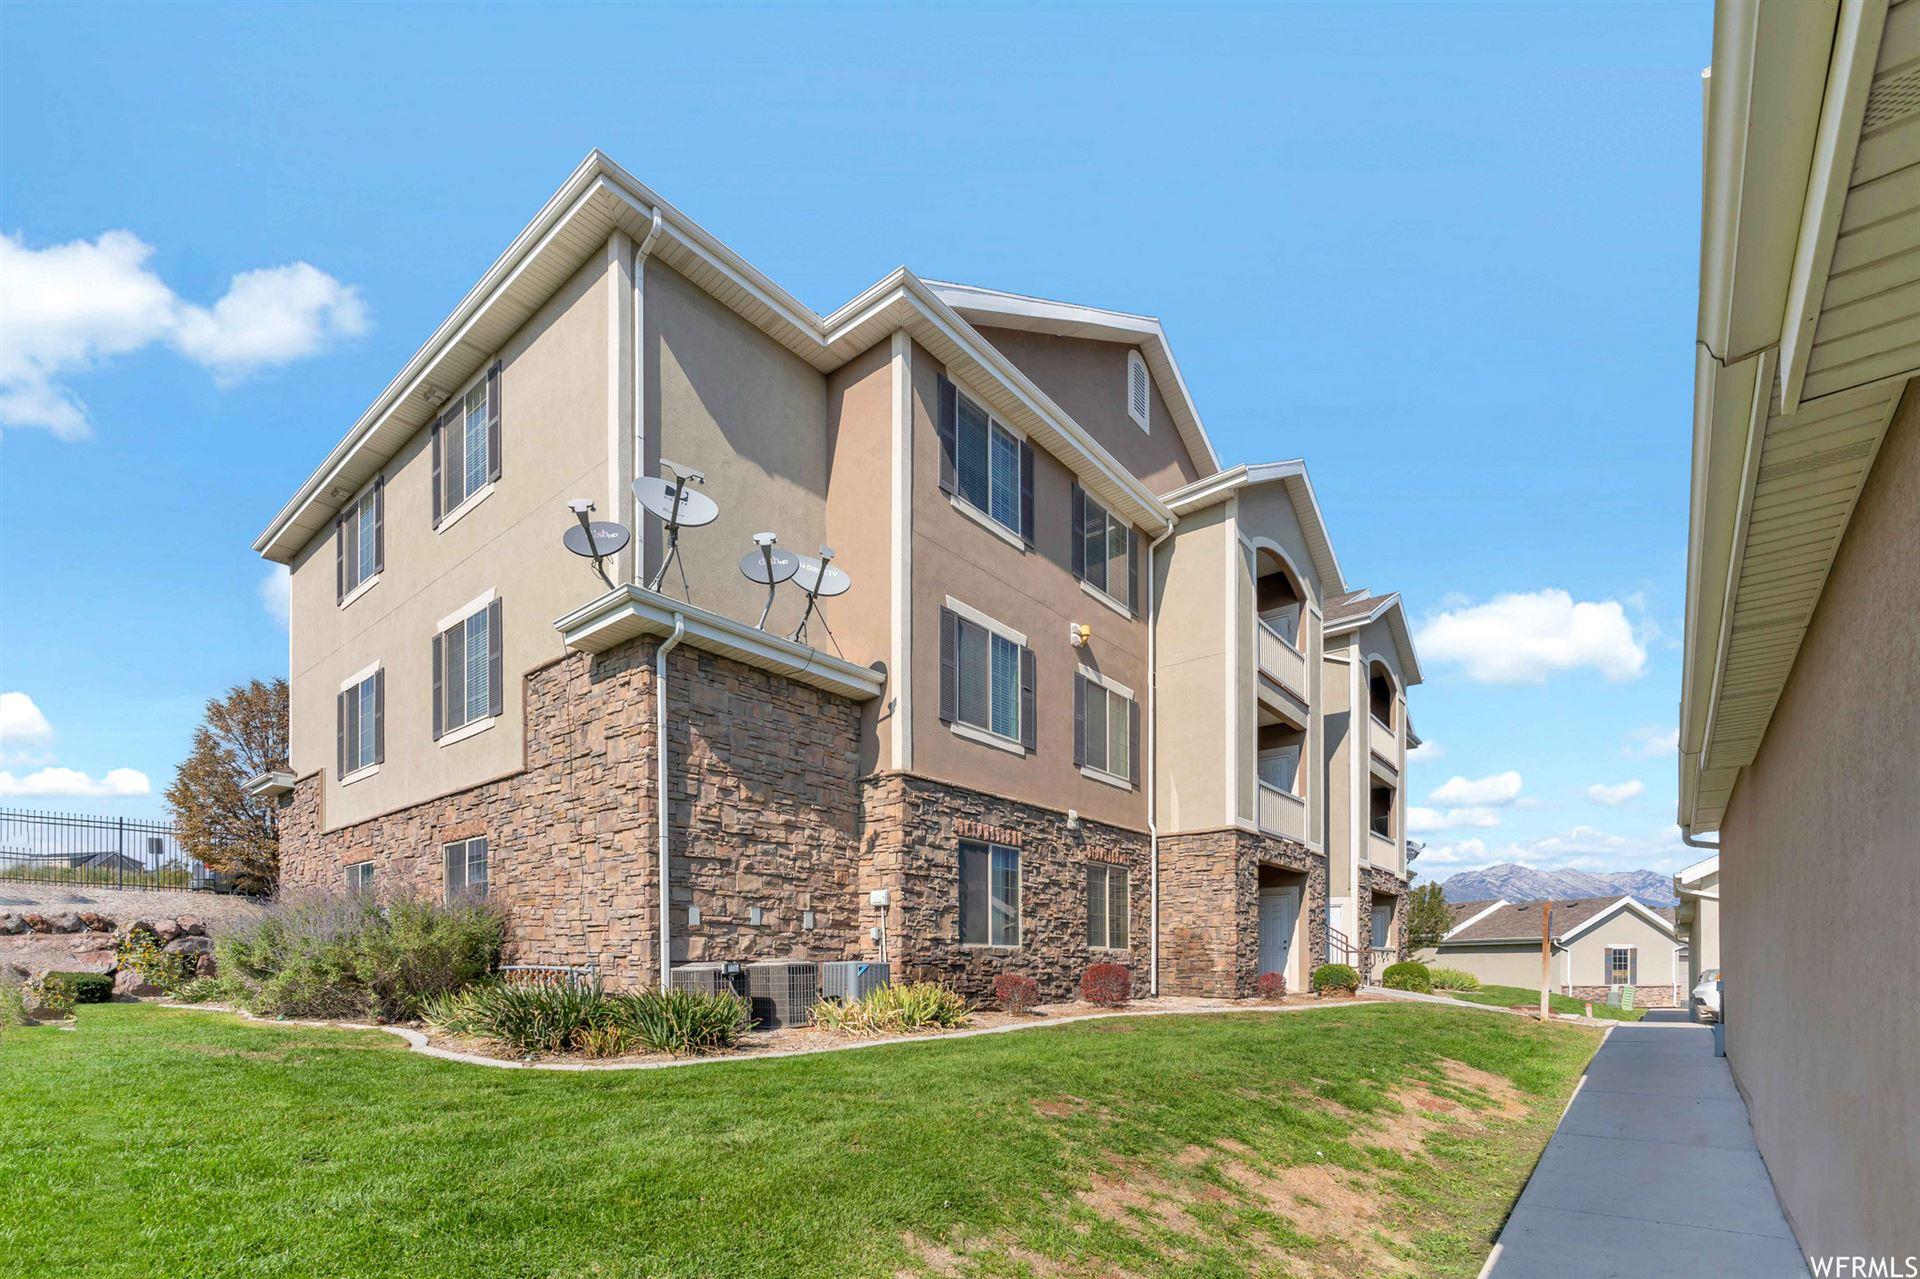 Photo of 136 W SPRING HILL N WAY, Saratoga Springs, UT 84045 (MLS # 1769644)